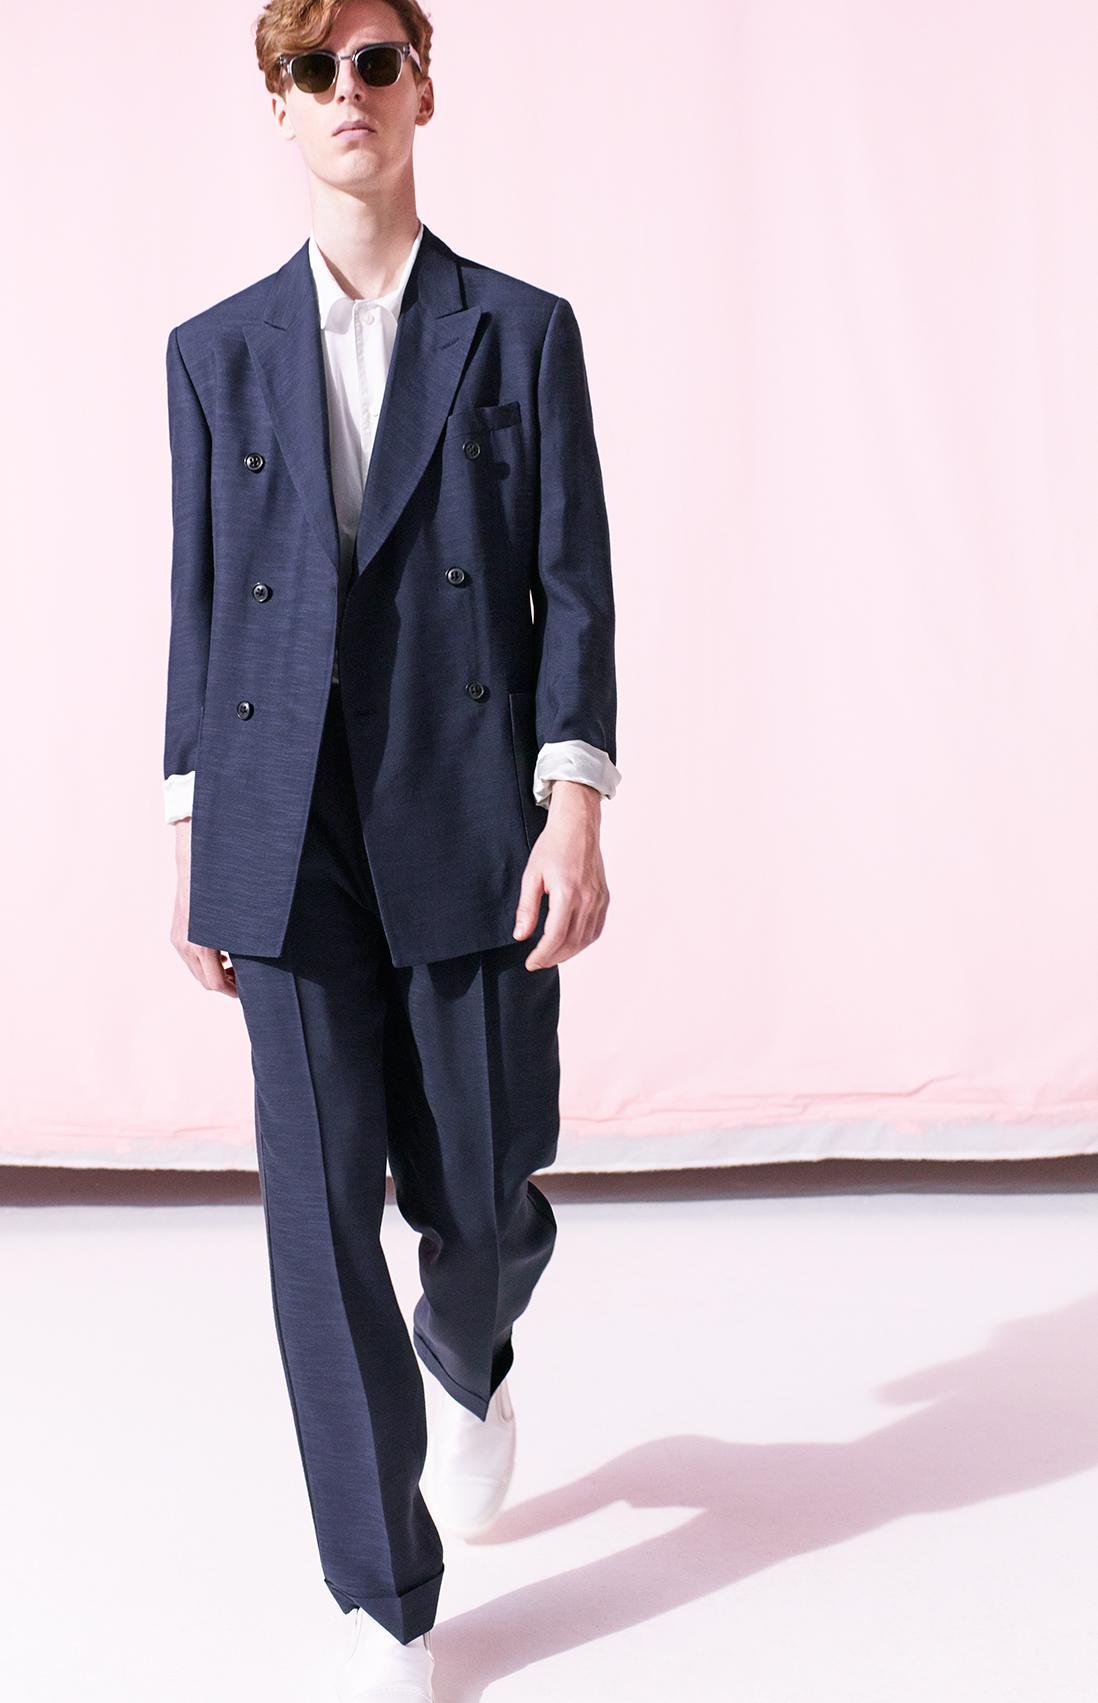 ce9171d9e9c0 Spring Summer 2015 Men s Ready to Wear Lookbook - Marc Jacobs